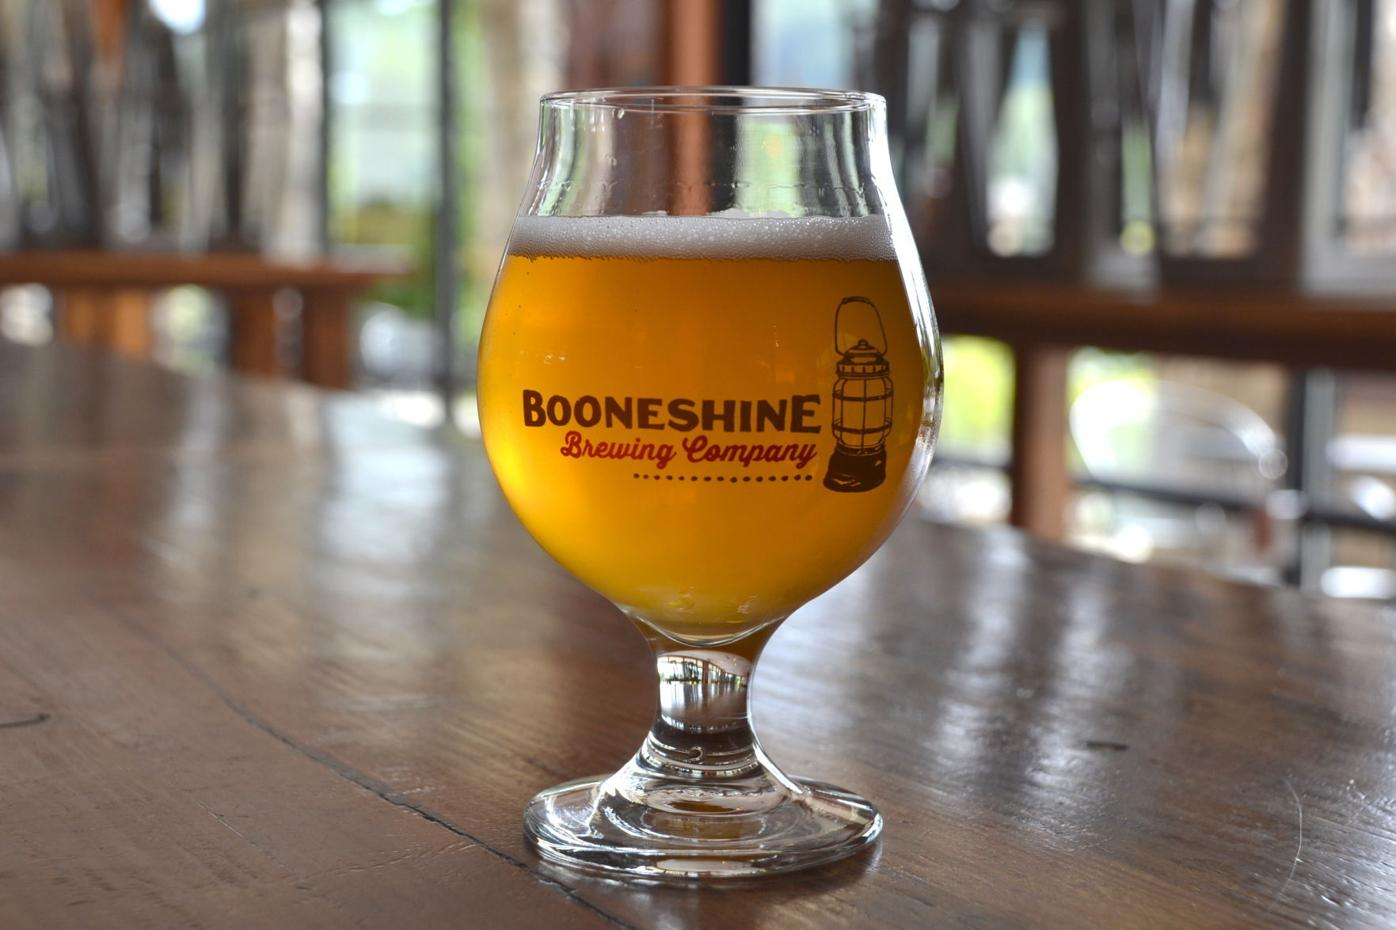 Booneshine ale